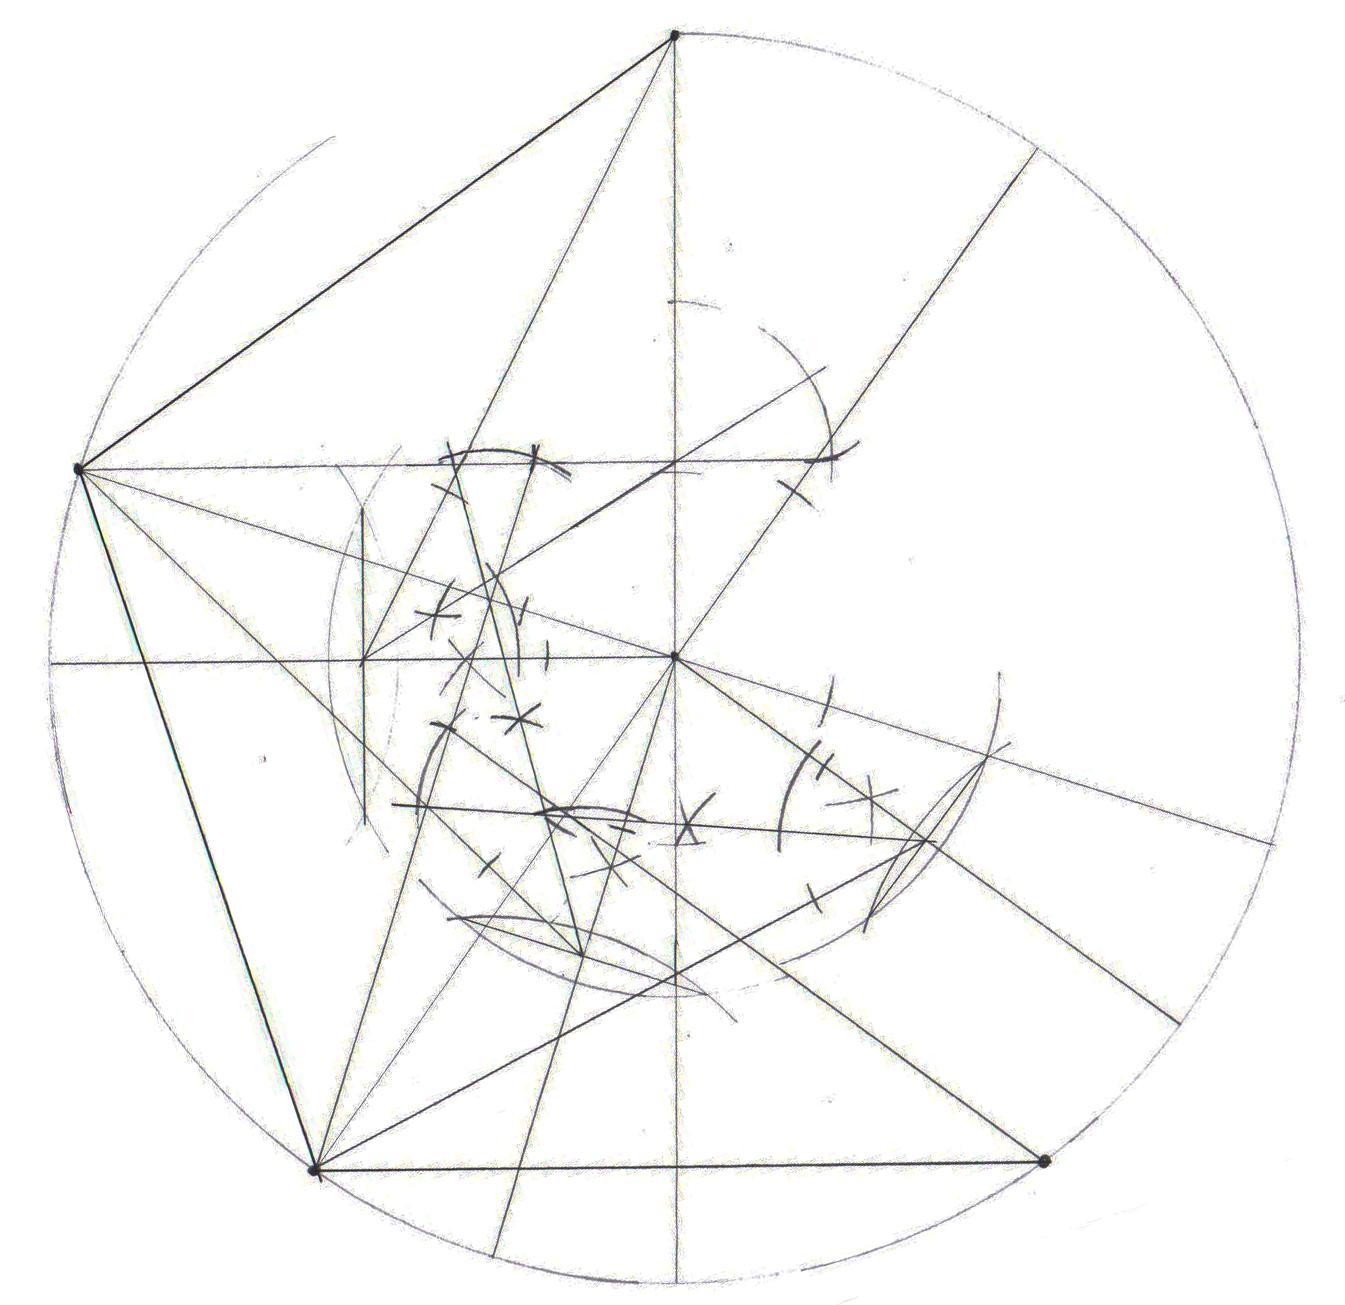 1345x1305 Essay 2 Constructing Regular Polygons